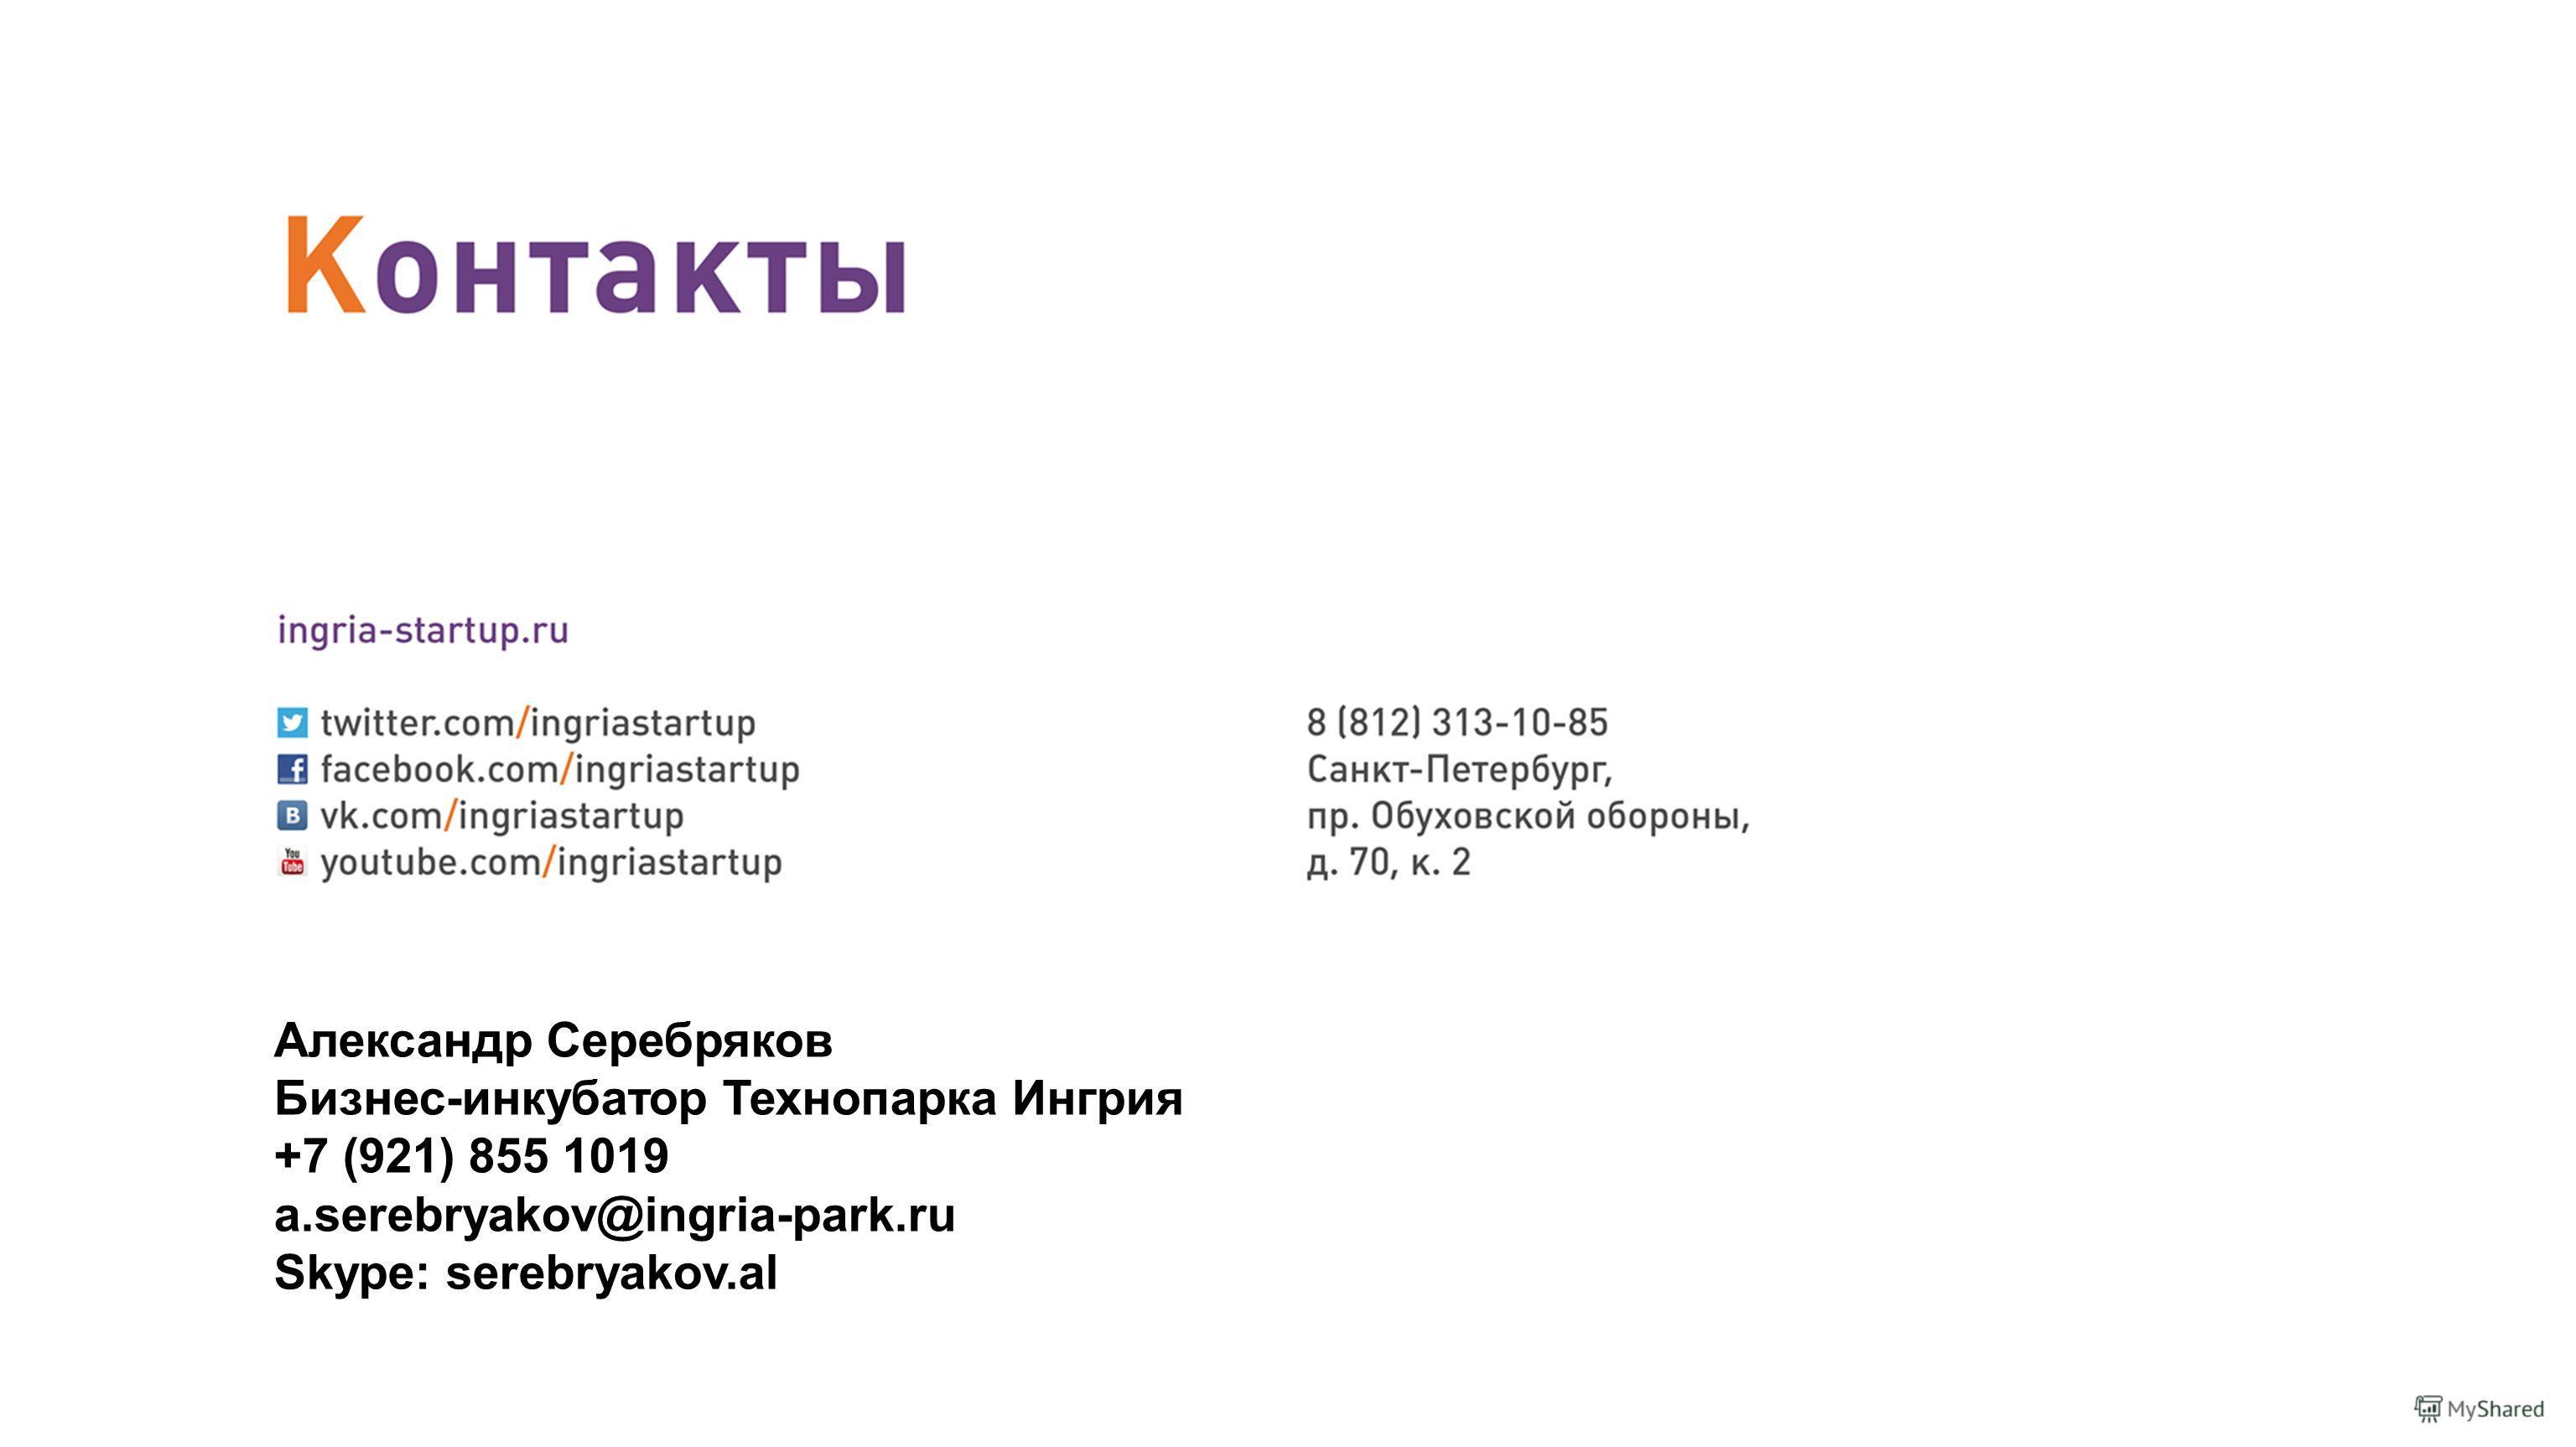 Александр Серебряков Бизнес-инкубатор Технопарка Ингрия +7 (921) 855 1019 a.serebryakov@ingria-park.ru Skype: serebryakov.al